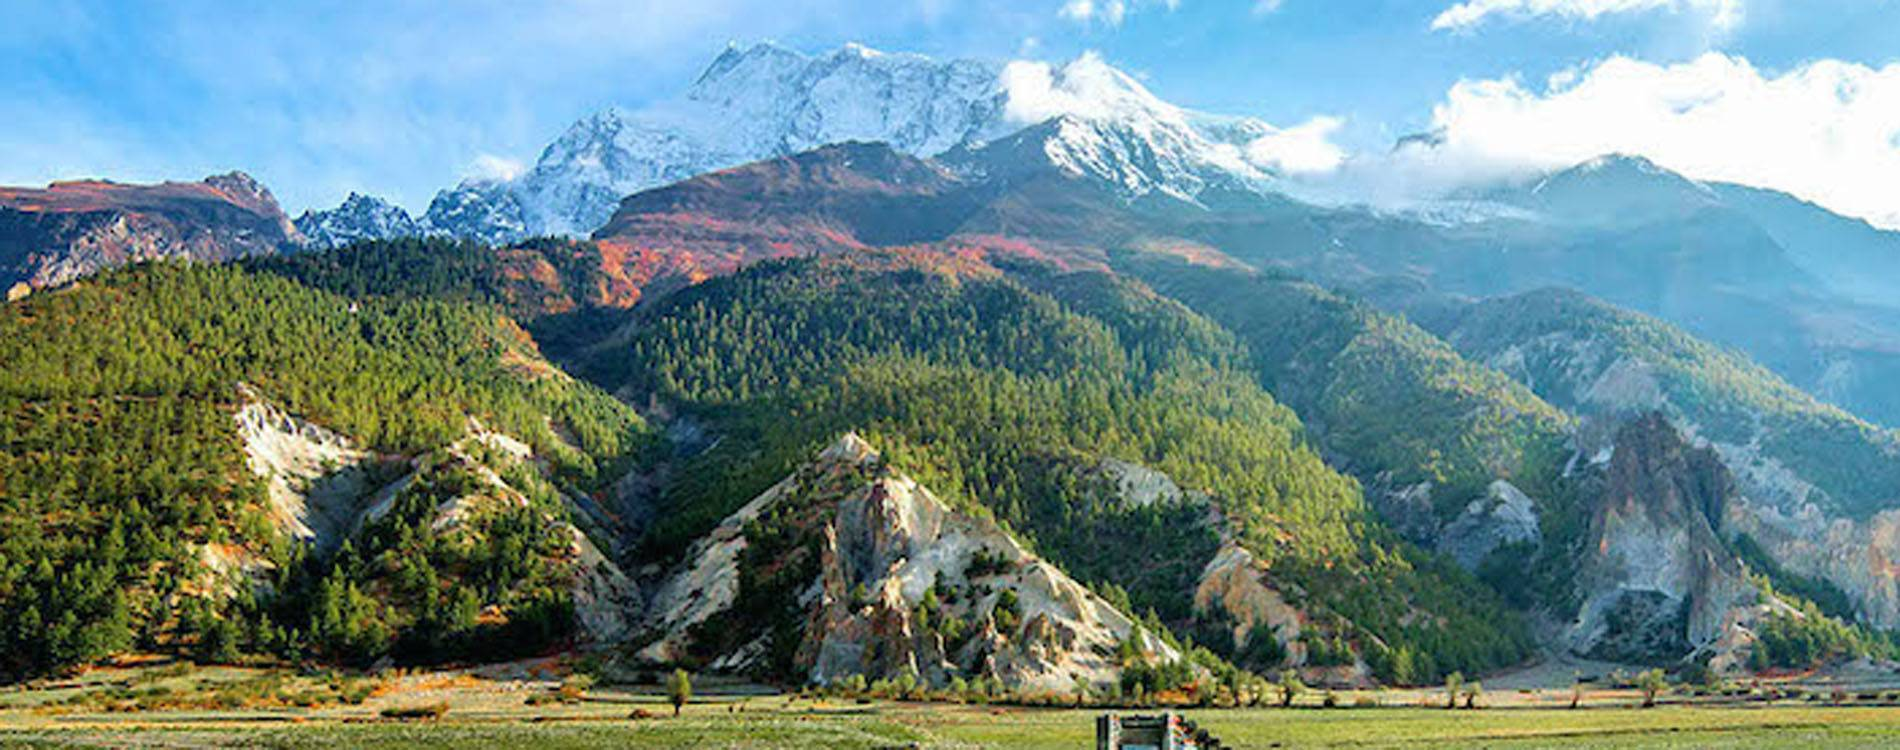 15 Days Annapurna Circuit Trek